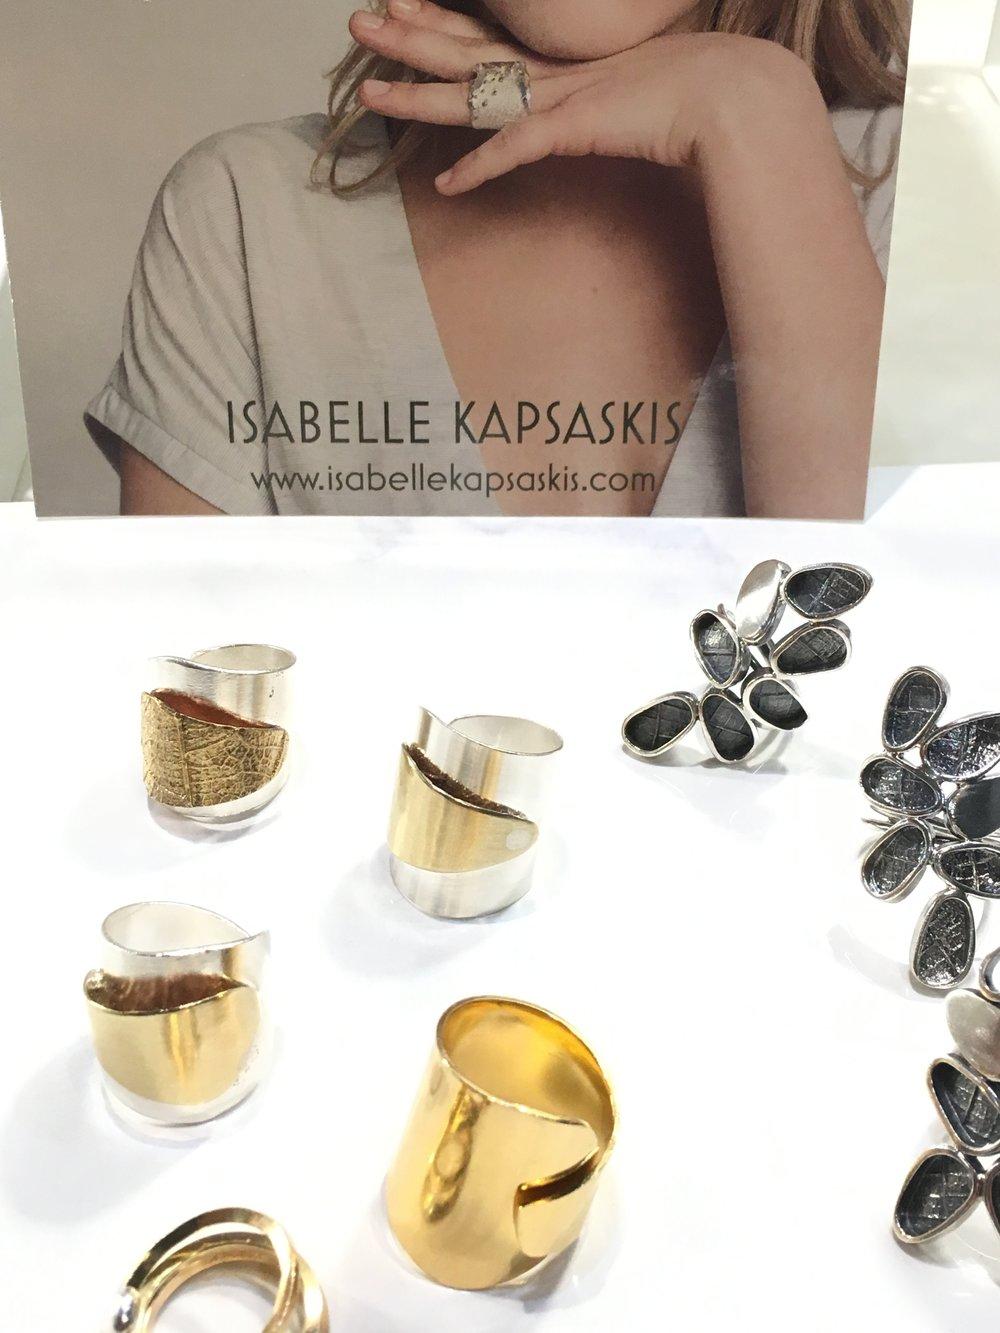 isabelle kapsaskis gold and silver.JPG